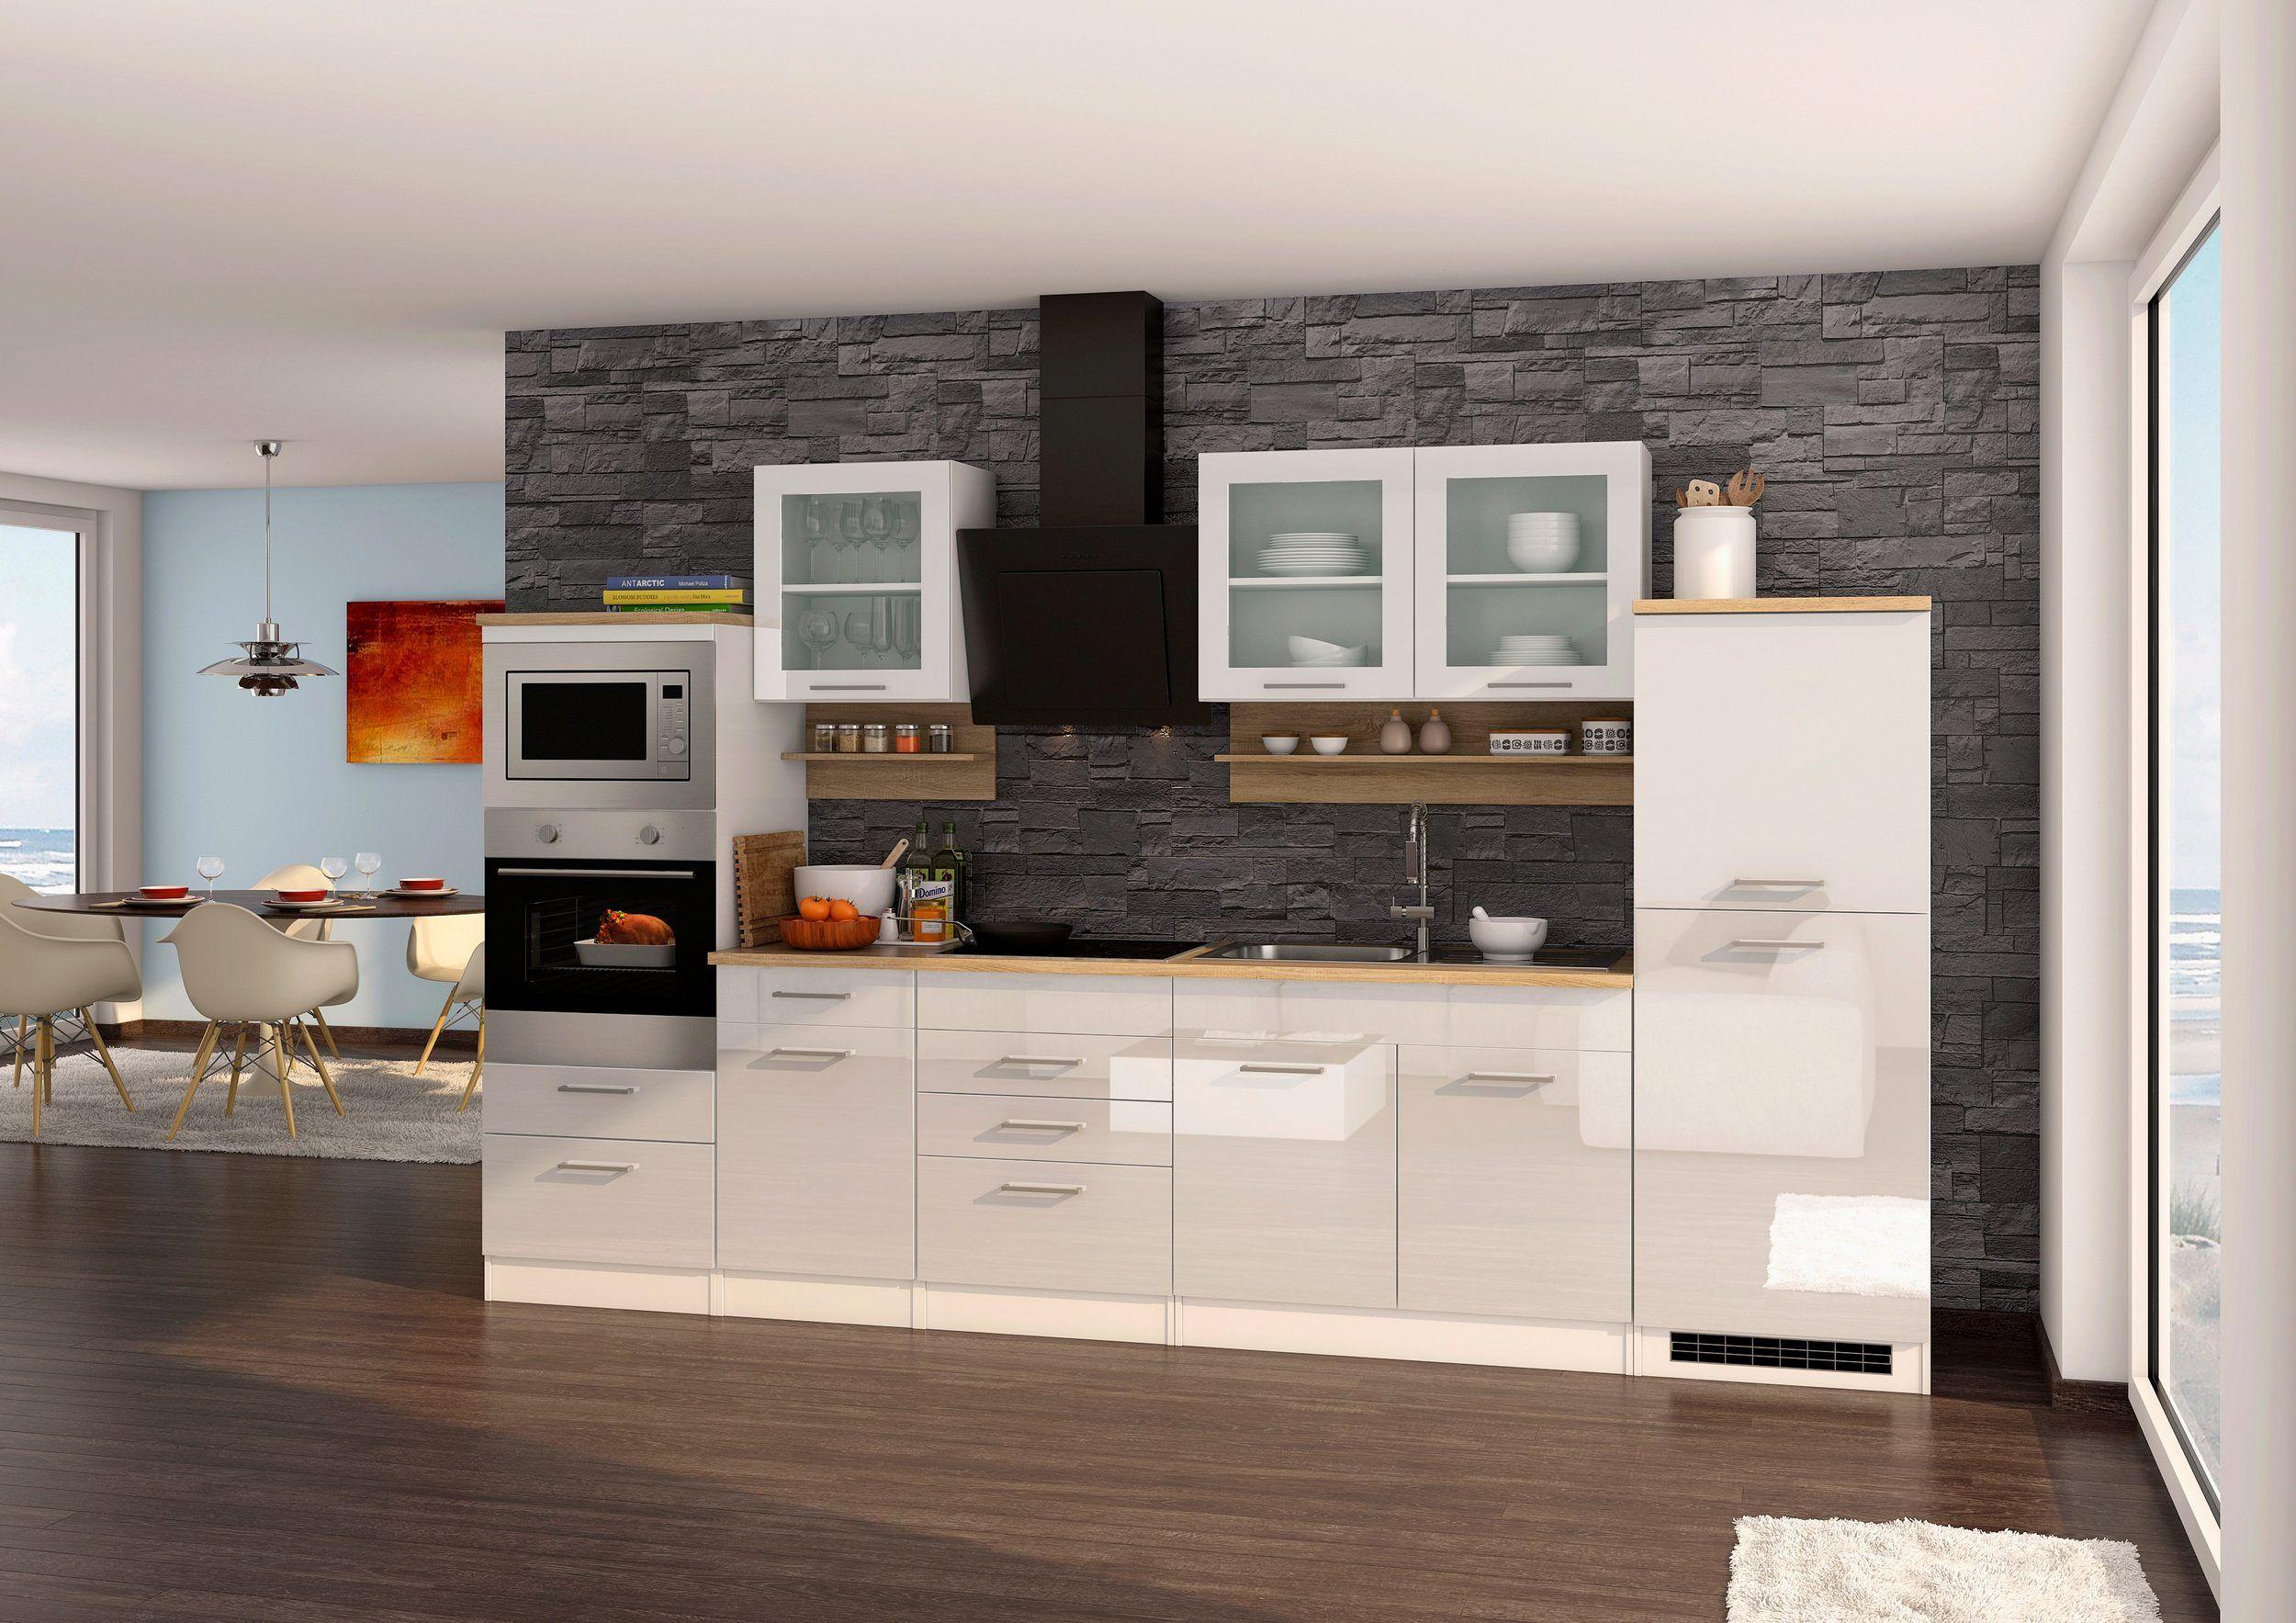 Held M 214 Bel Held Kitchen Cabinets Komnit Design Kitchen Kitchen Cabinets Cabinet